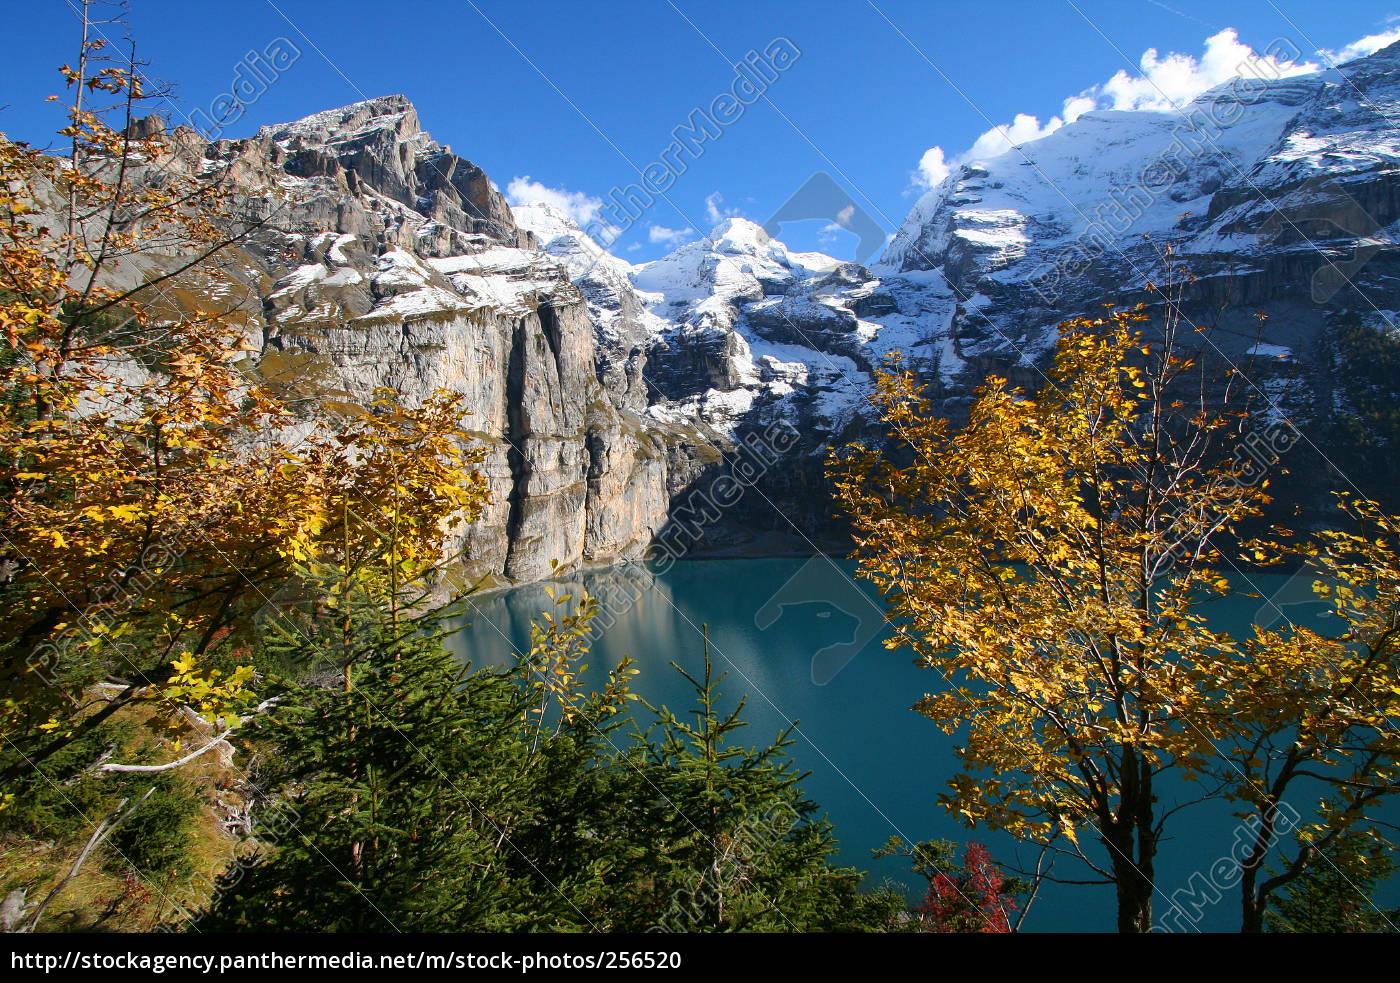 autumn, day, at, oeschinensee - 256520